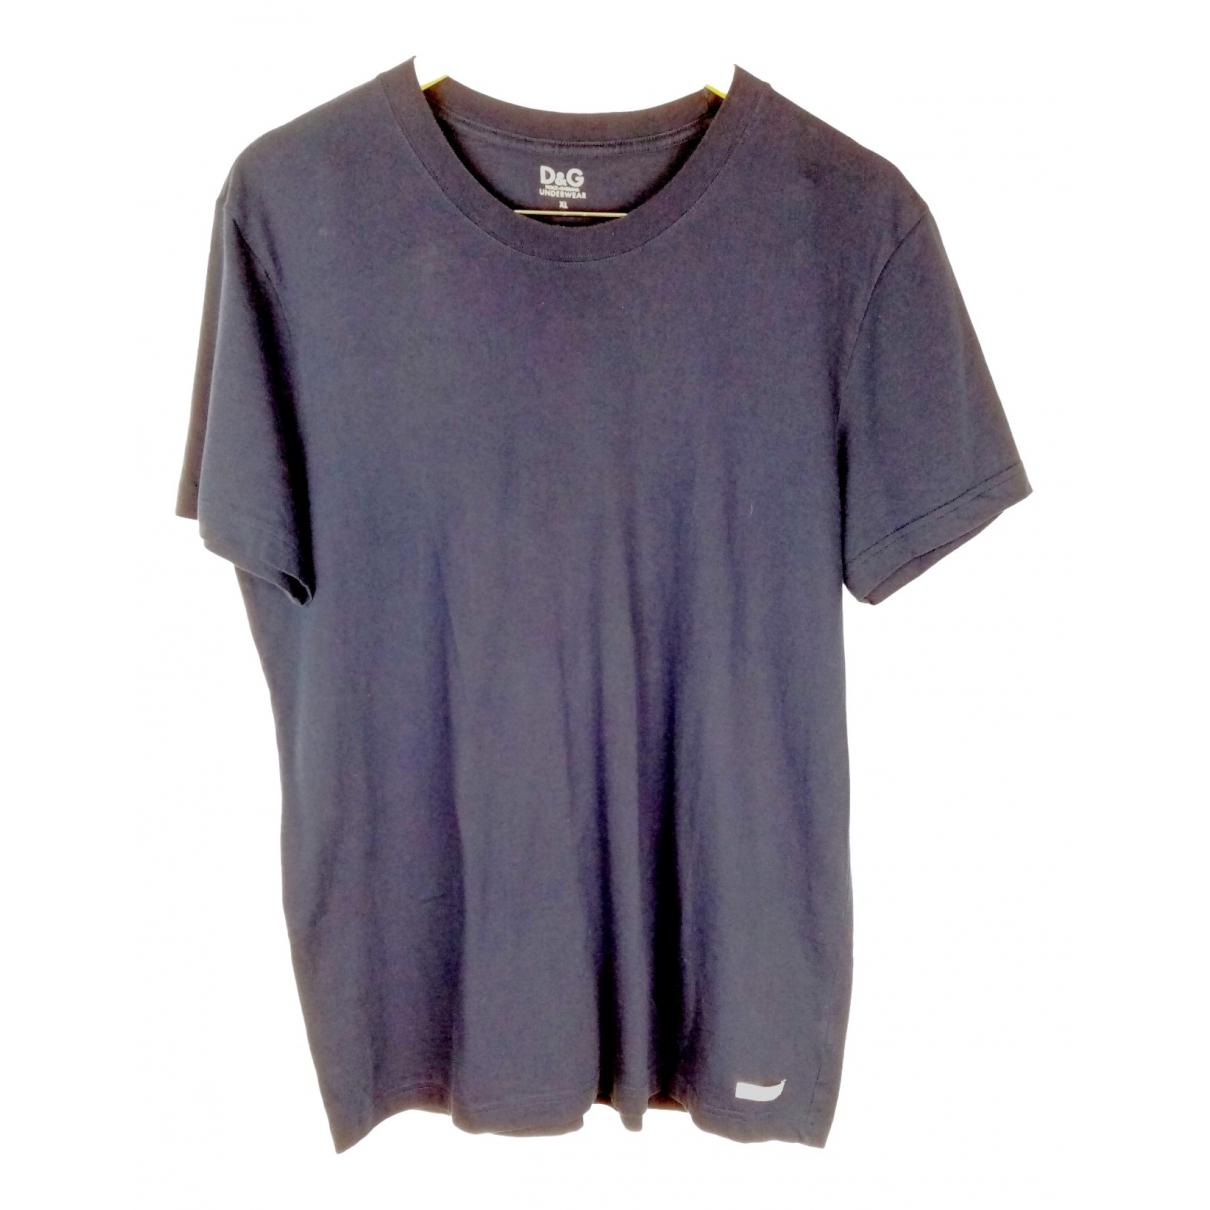 D&g \N Navy Cotton T-shirts for Men XL International